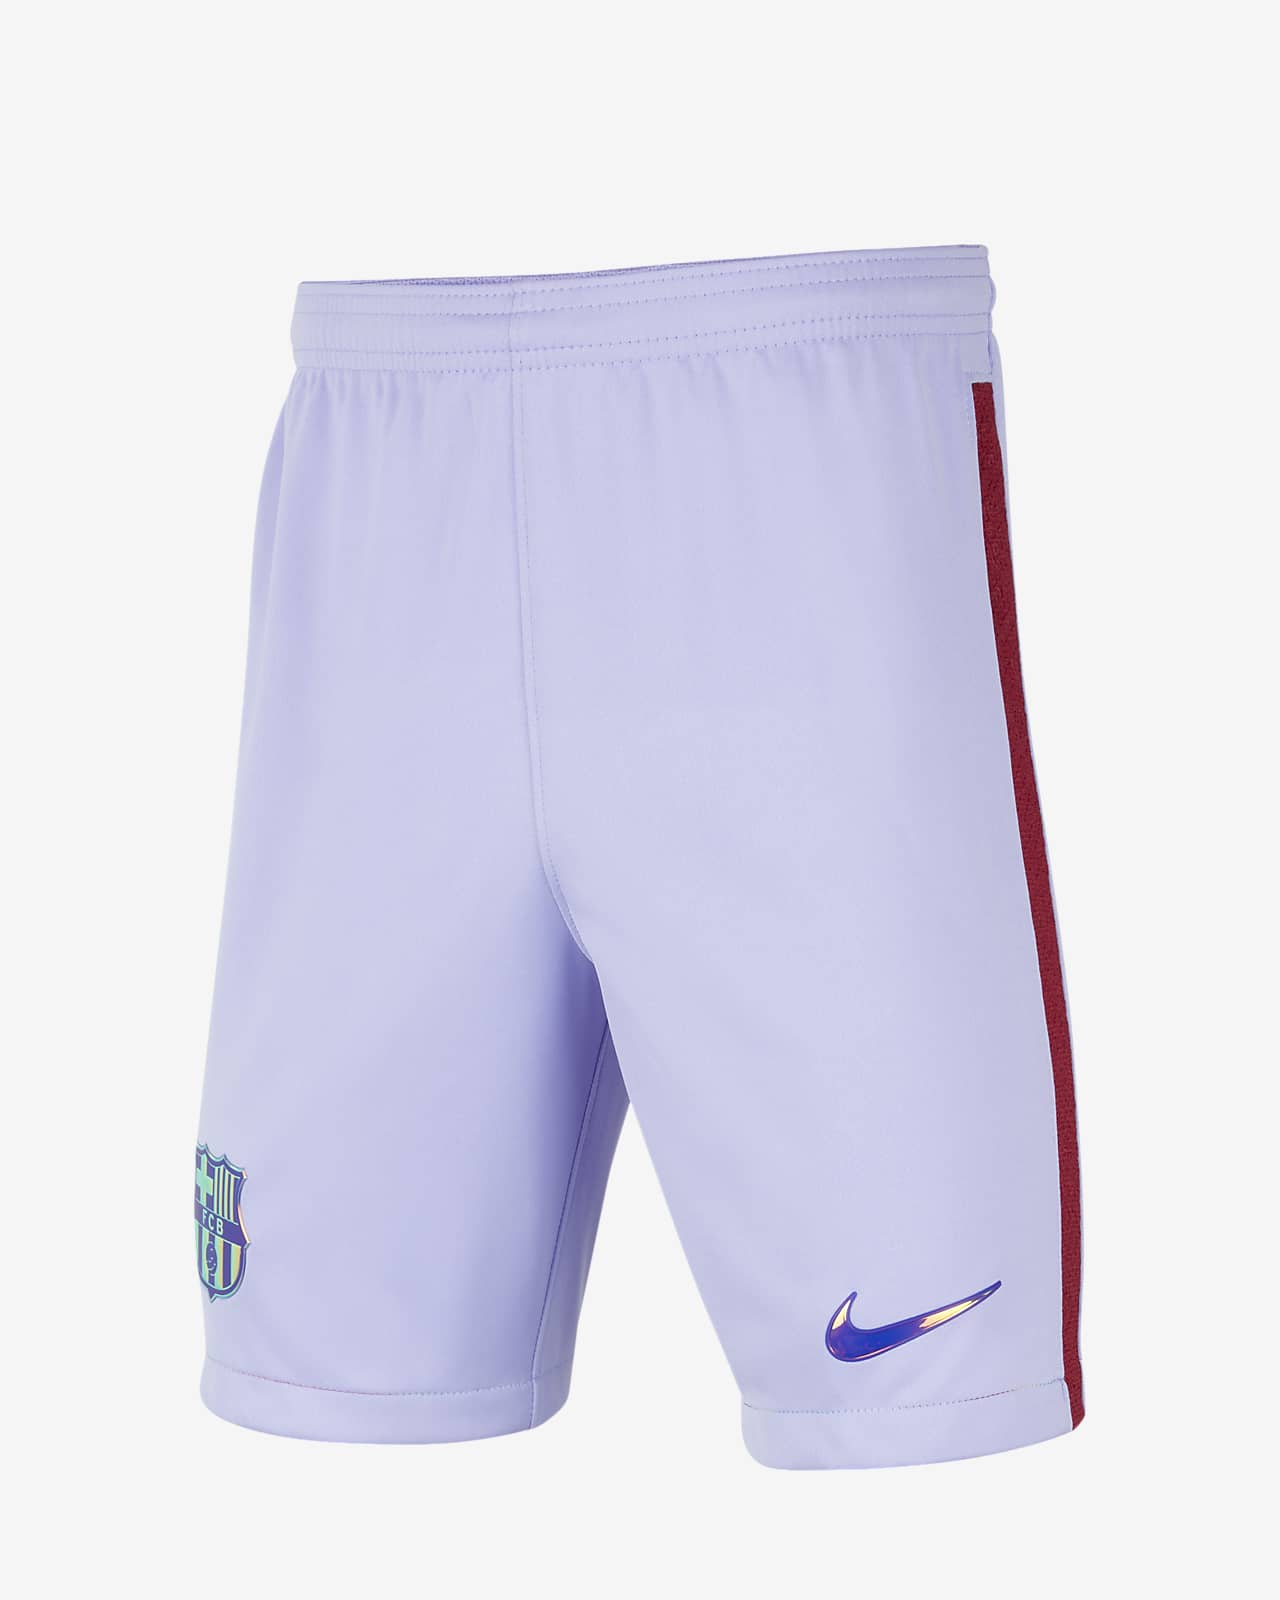 F.C. Barcelona 2021/22 Stadium Home/Away Older Kids' Football Shorts